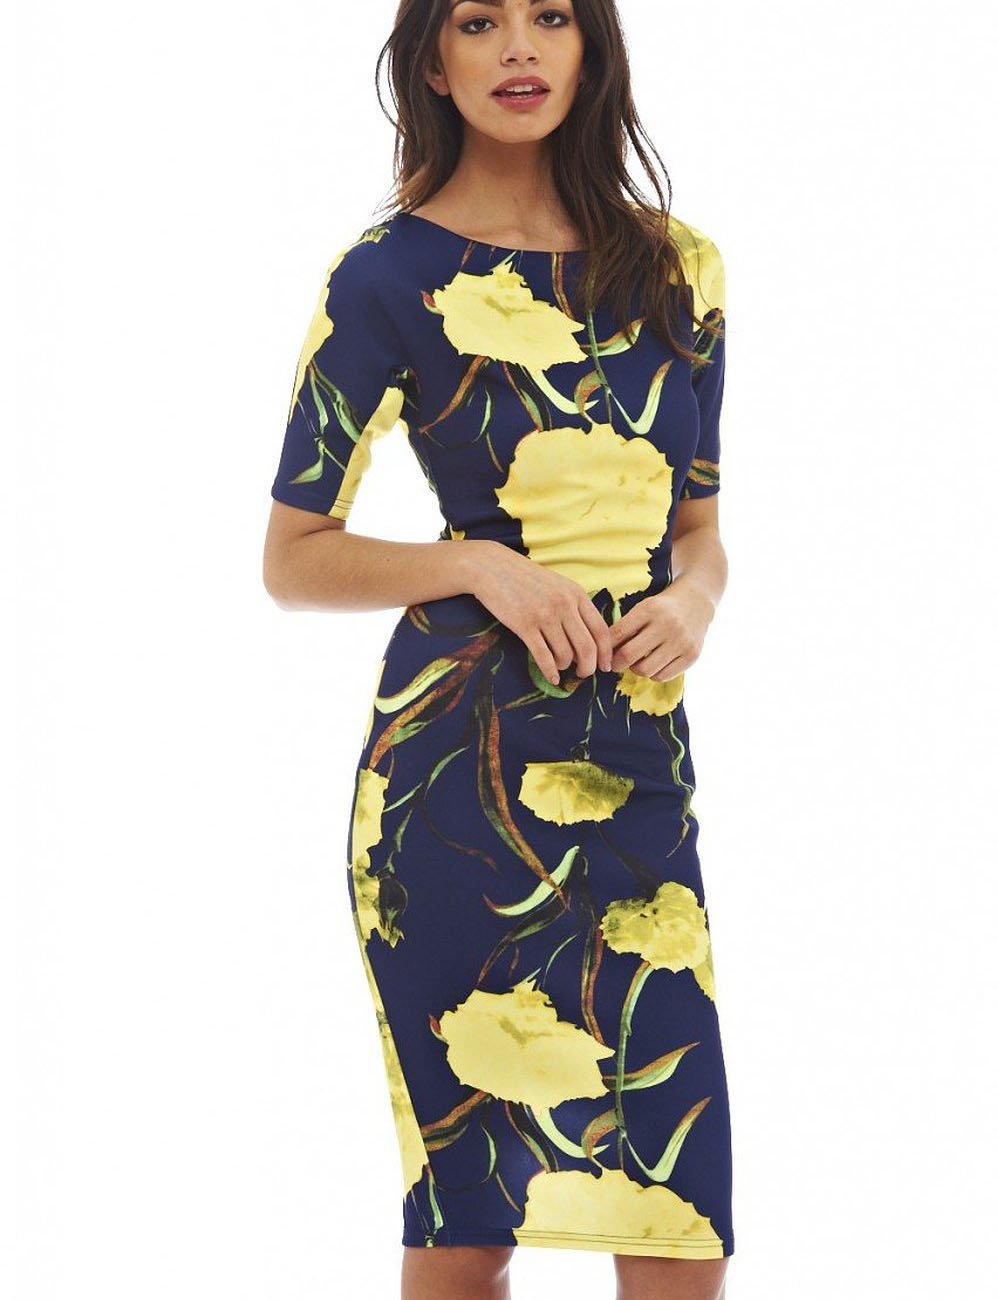 Women Dress Elegant Print Work Business Casual Party Summer Sheath Vestidos Plus Size 106 short dresses office wear